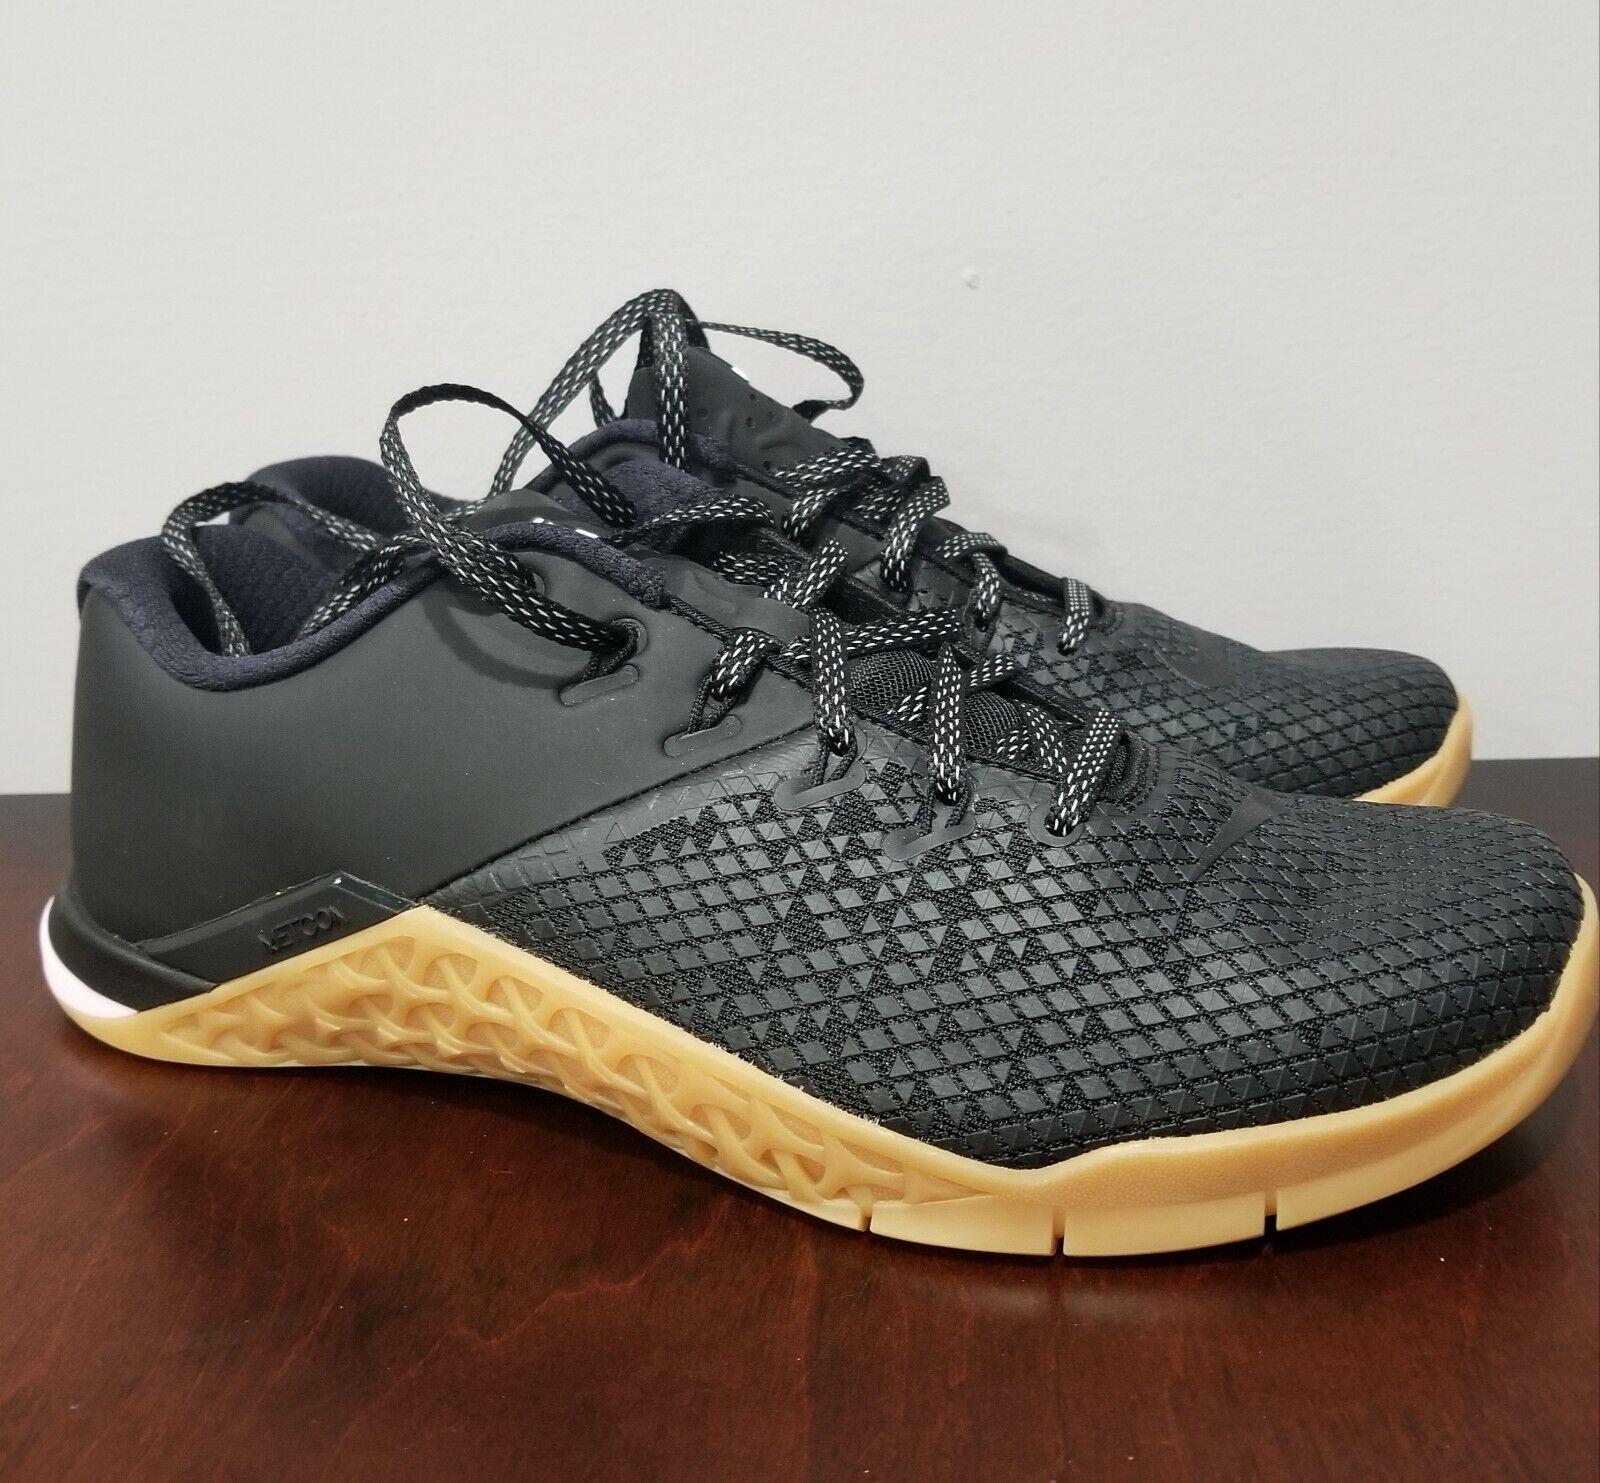 Size 8.5 - Nike Metcon 4 XD Chalkboard